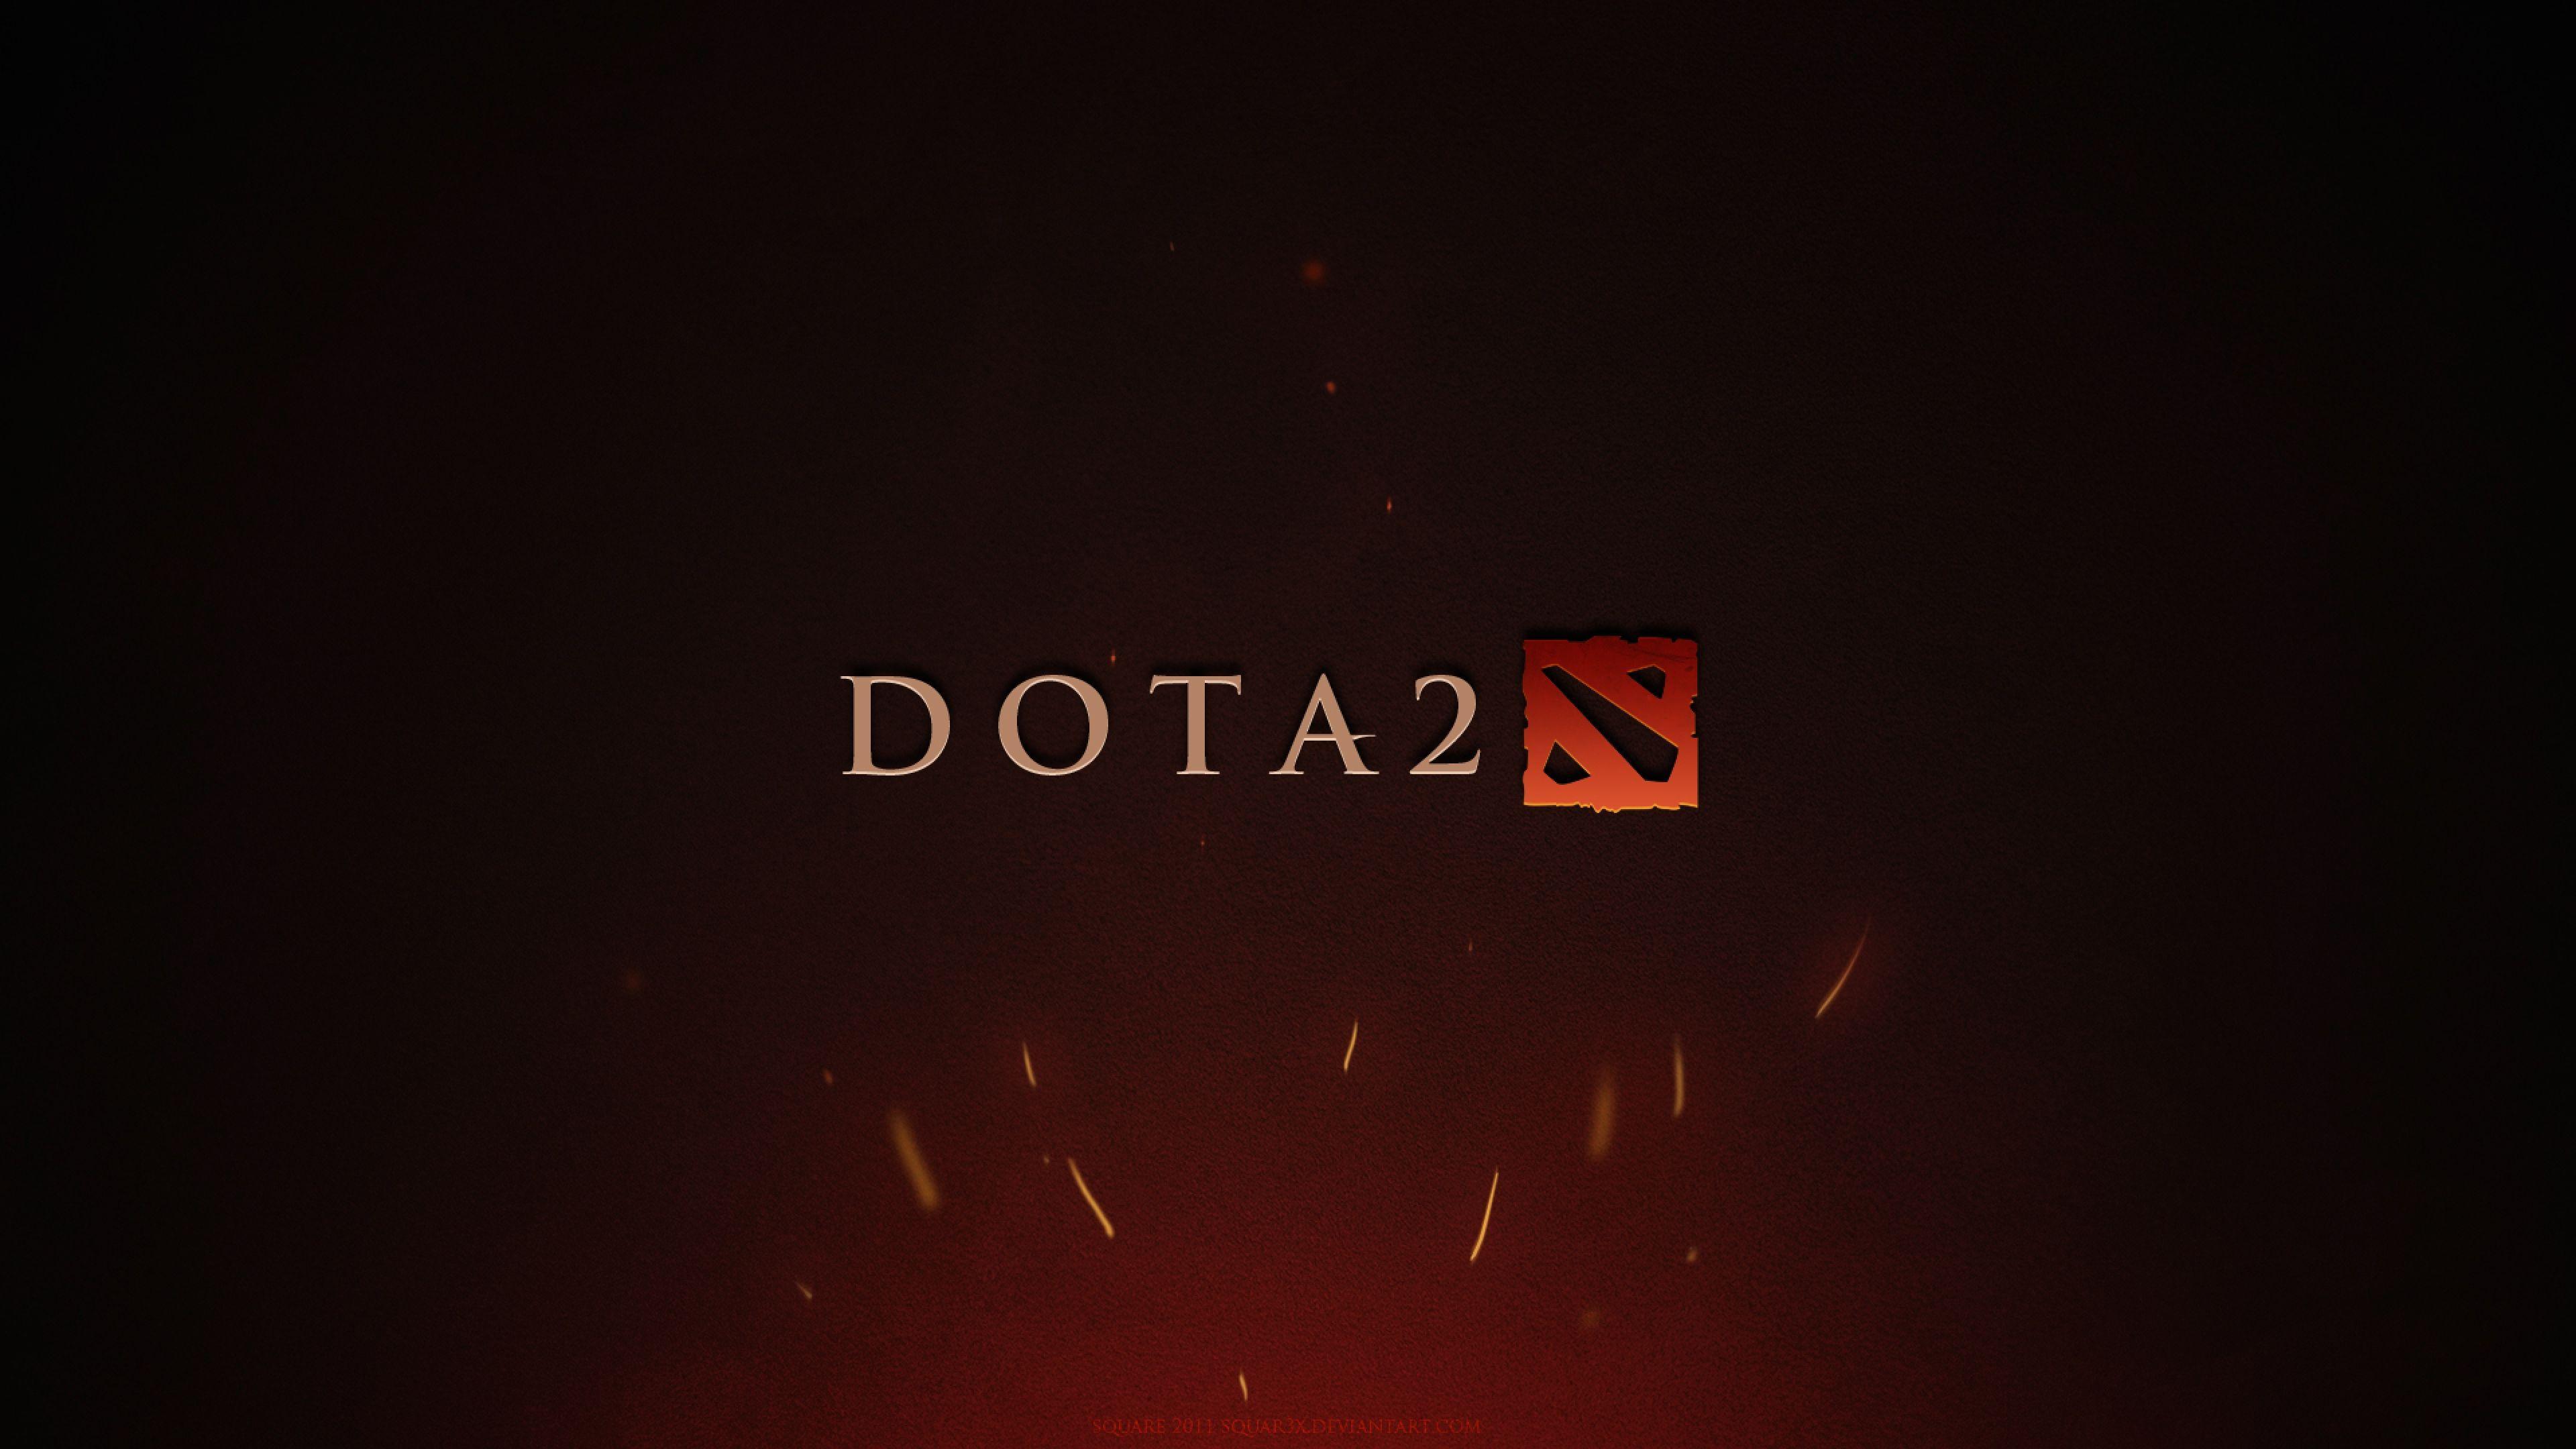 Dota 2 Logo Wallpapers Top Free Dota 2 Logo Backgrounds